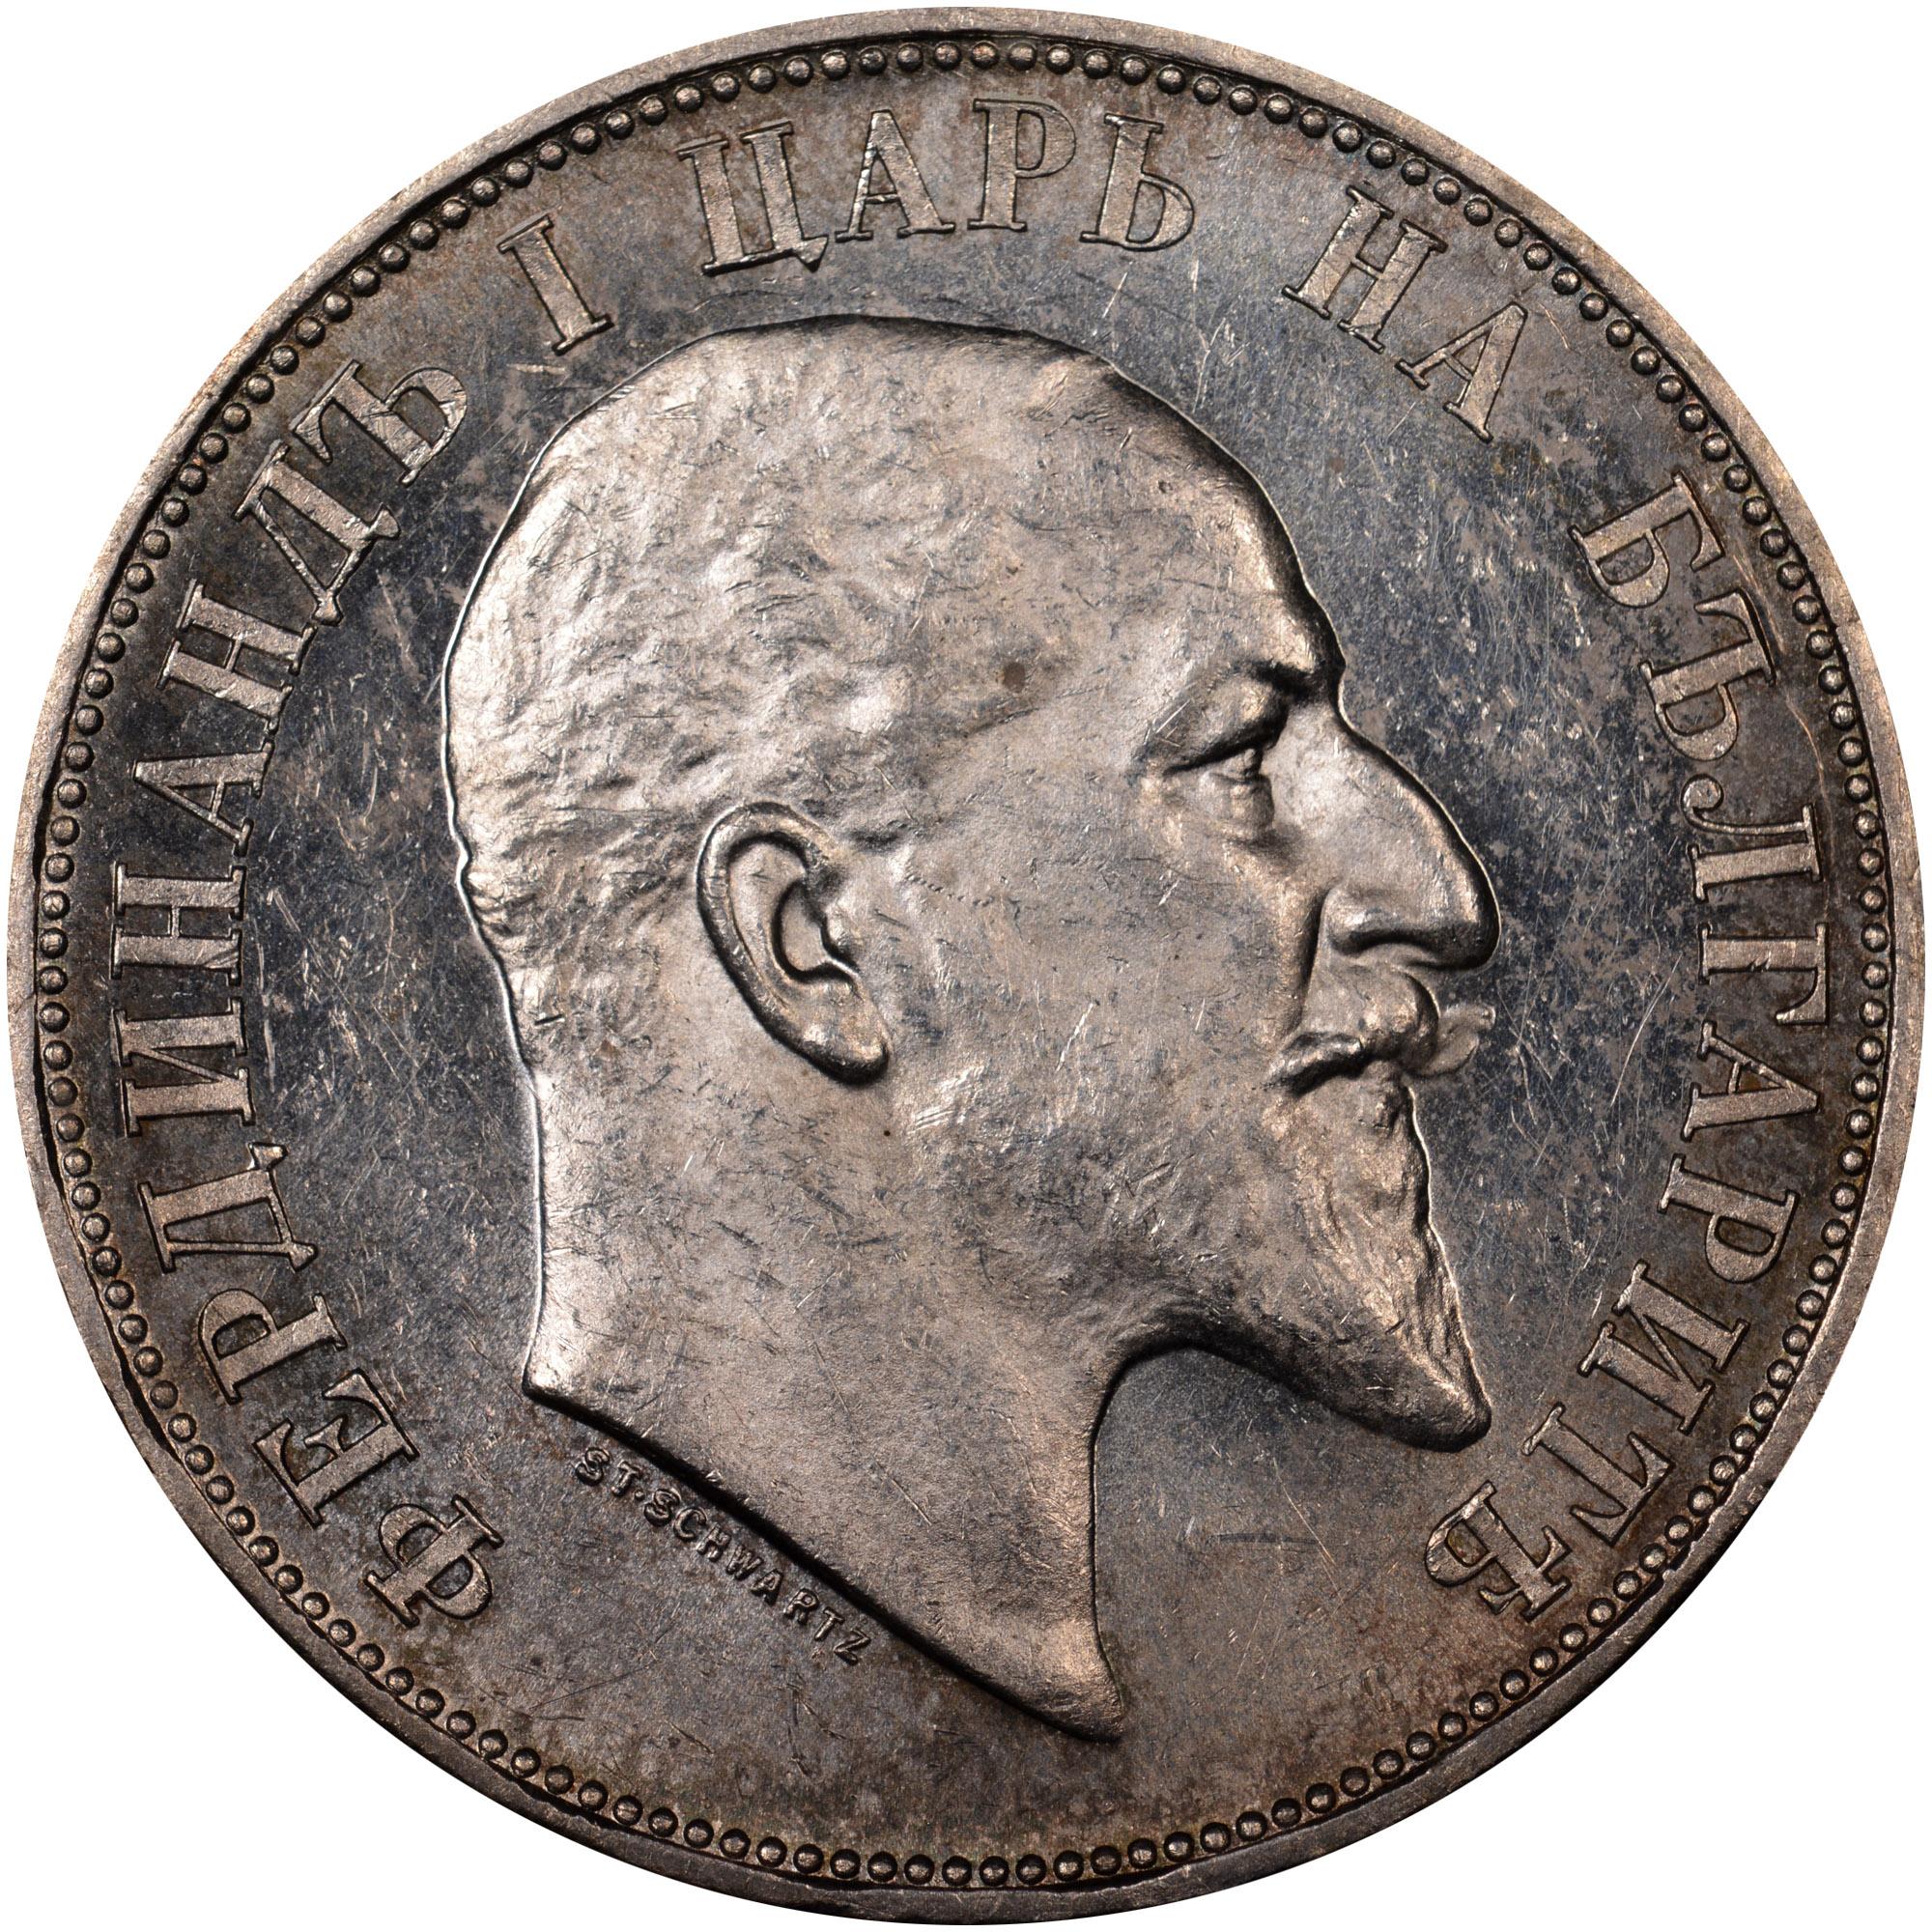 1910 Bulgaria 2 Leva obverse